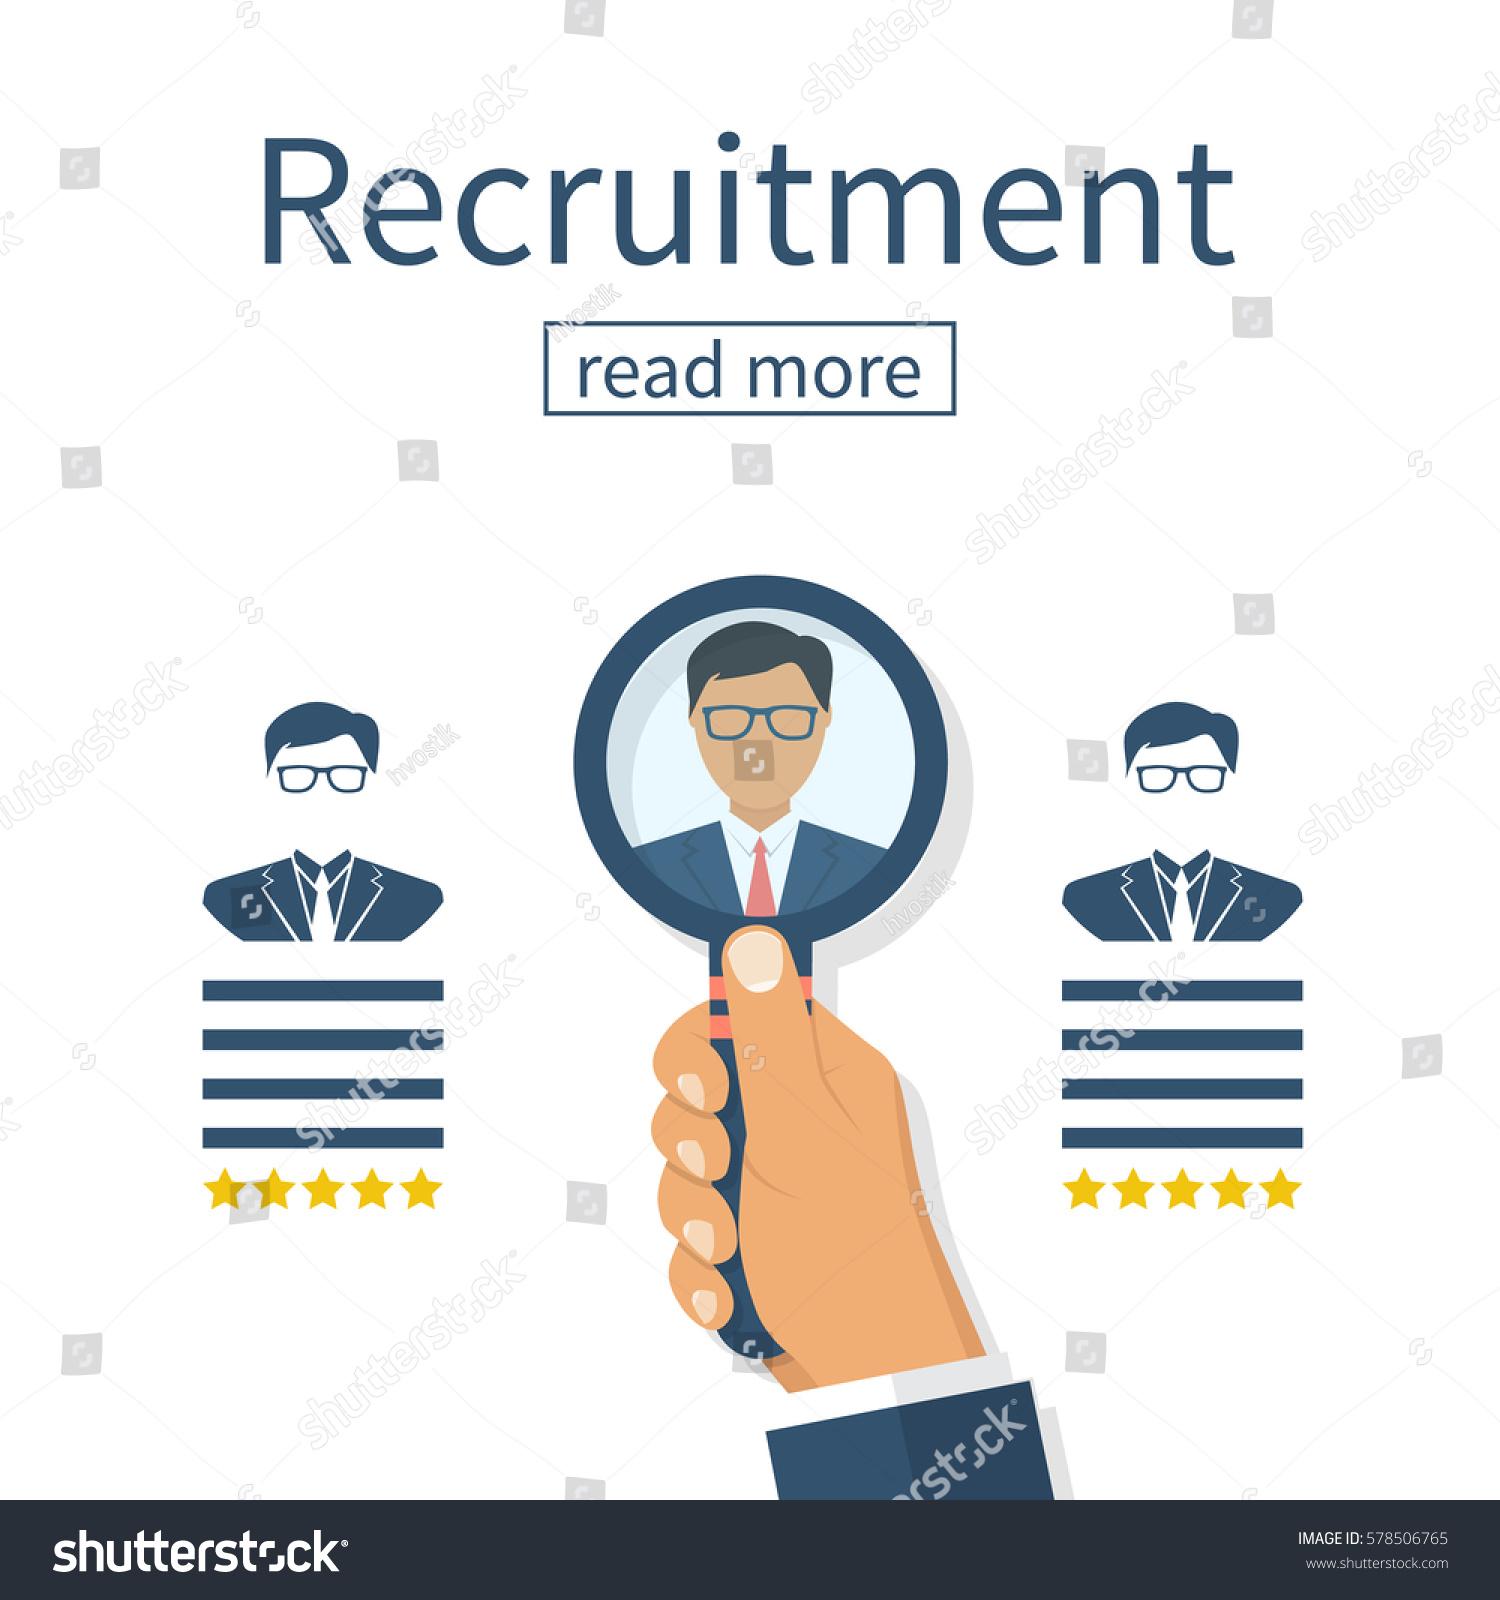 Recruitment Concept Human Resources Businessman Employer Stock